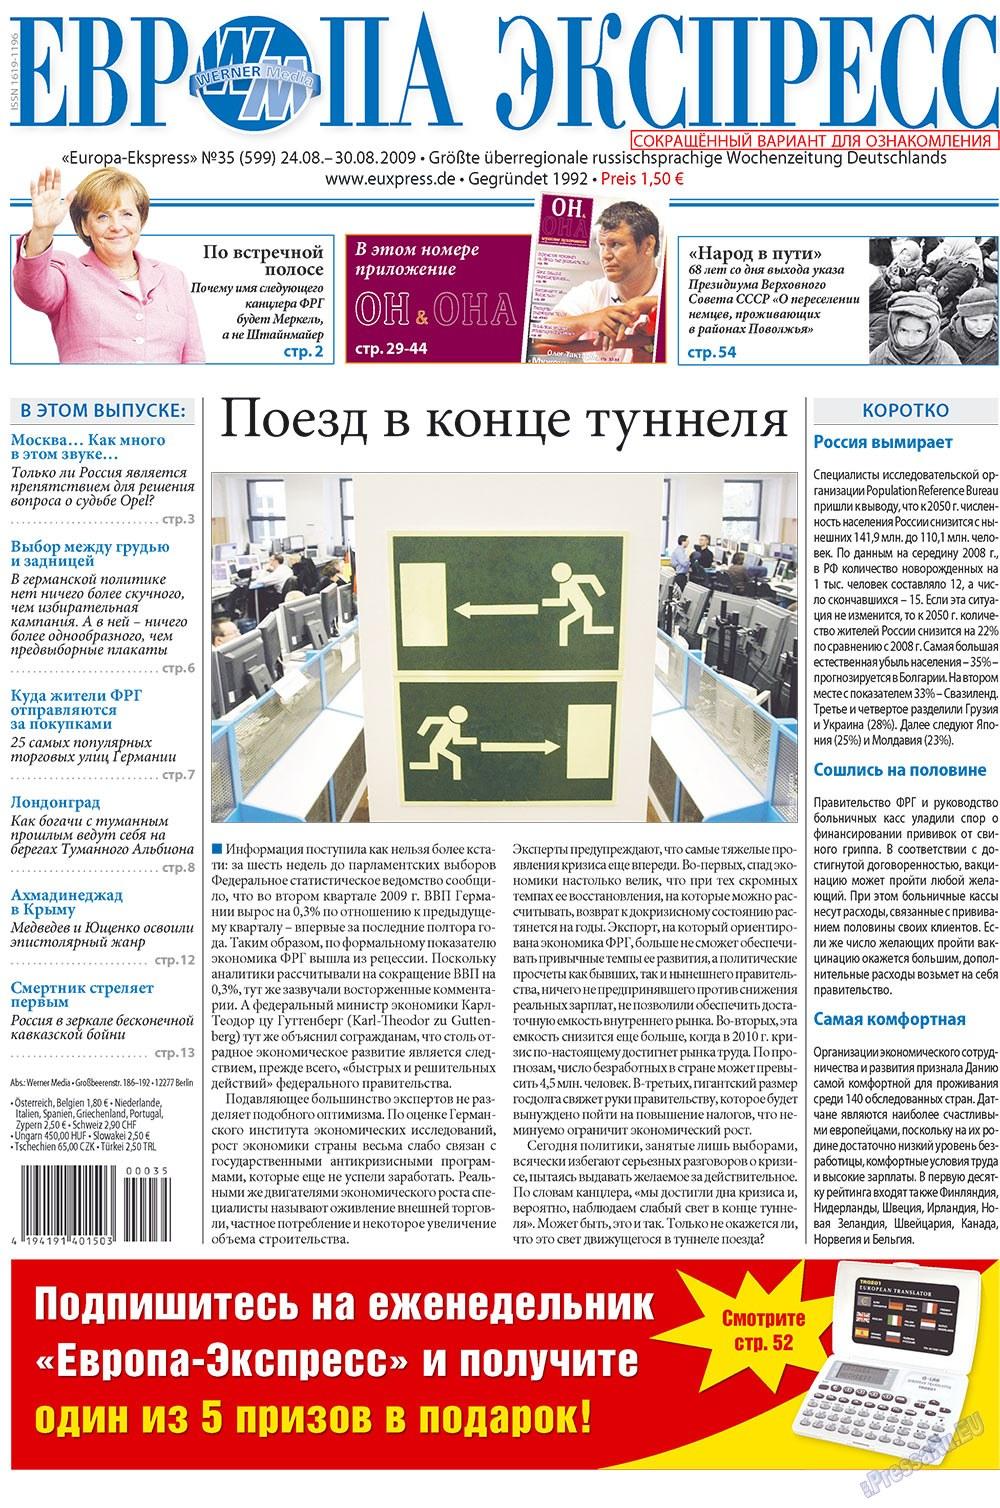 Европа экспресс (газета). 2009 год, номер 35, стр. 1